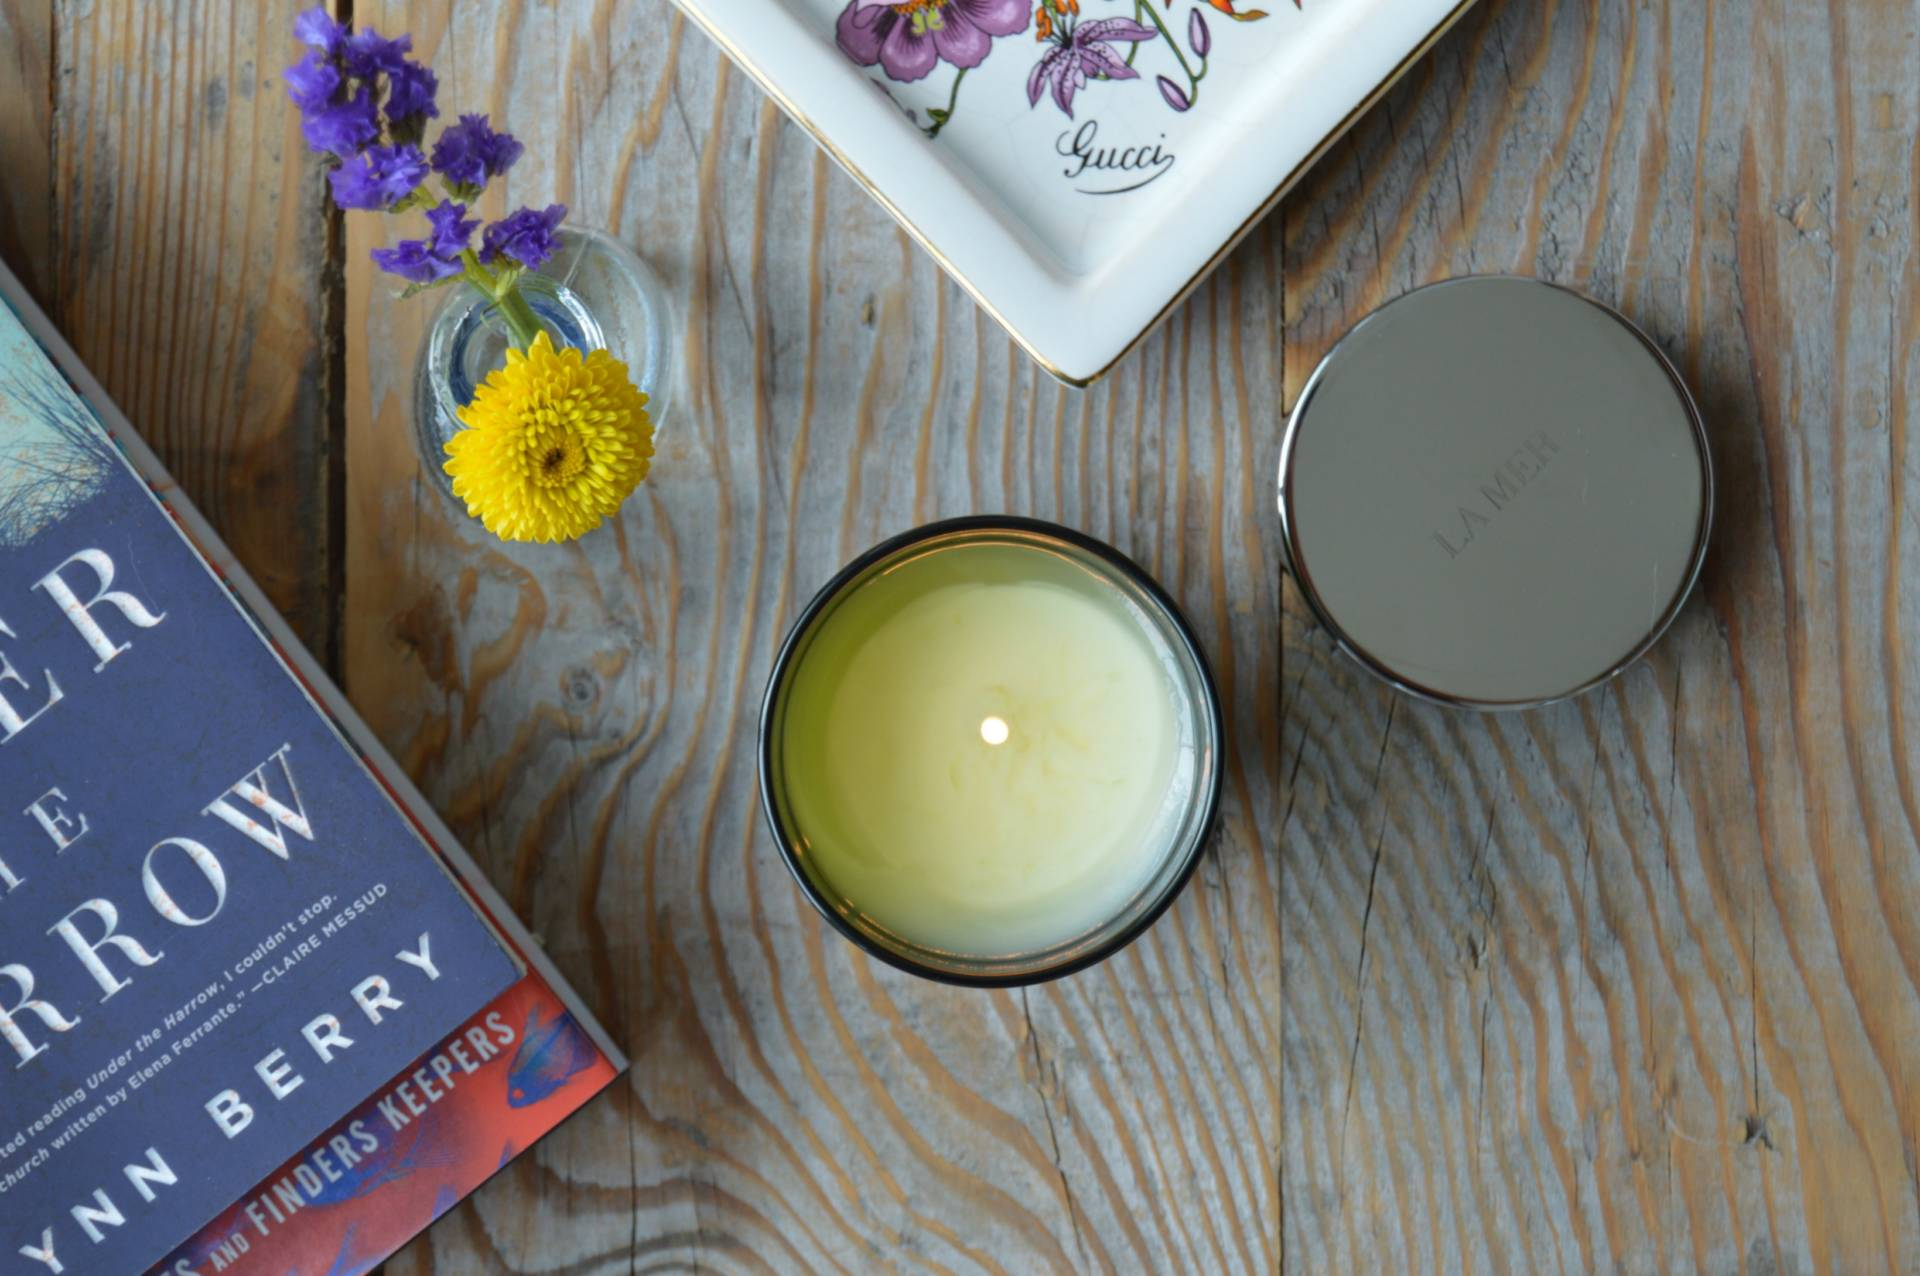 la mer creme candle limited edition neiman marcus in haute pursuit review